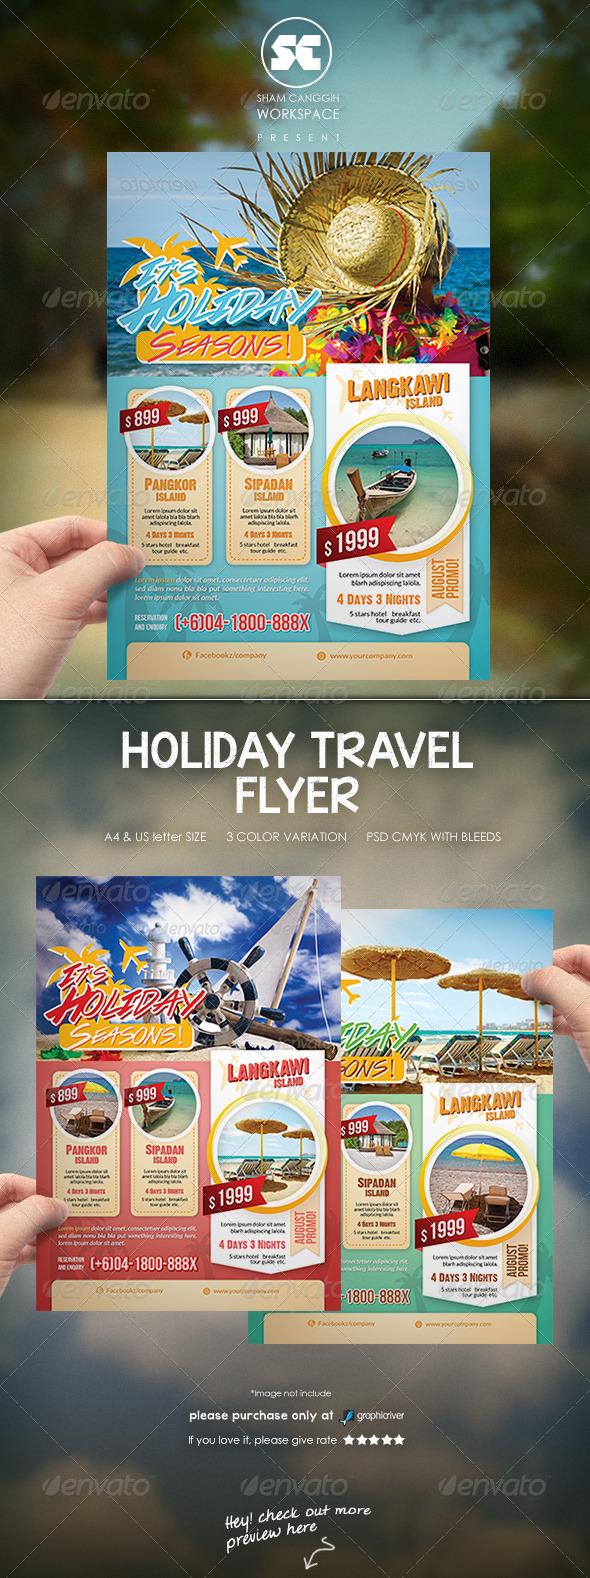 GraphicRiver Holiday Travel Flyer Magazine Ads 7701420